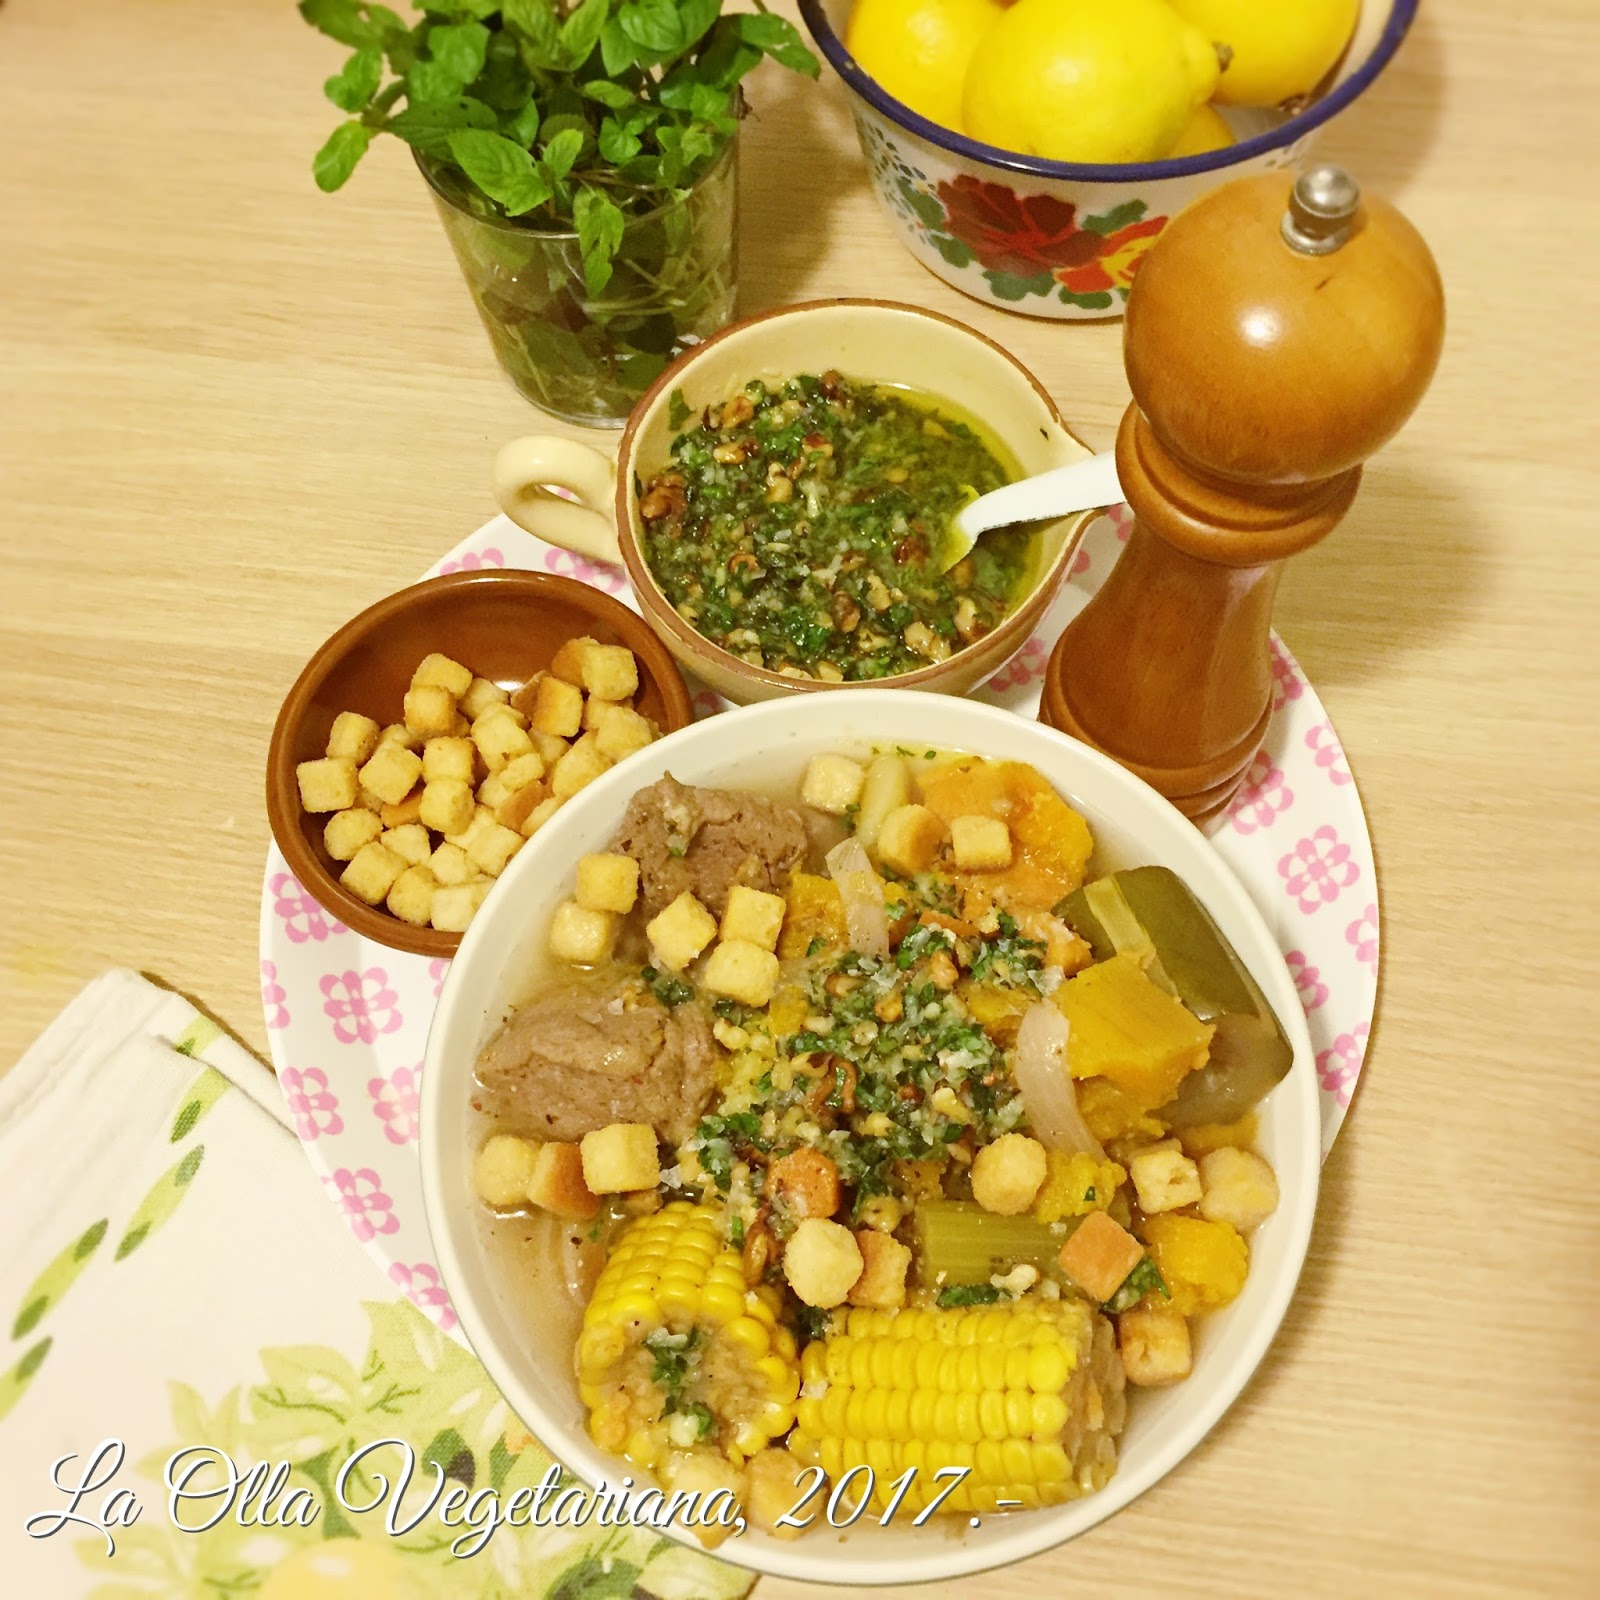 La Olla Vegetariana: Puchero de verduras